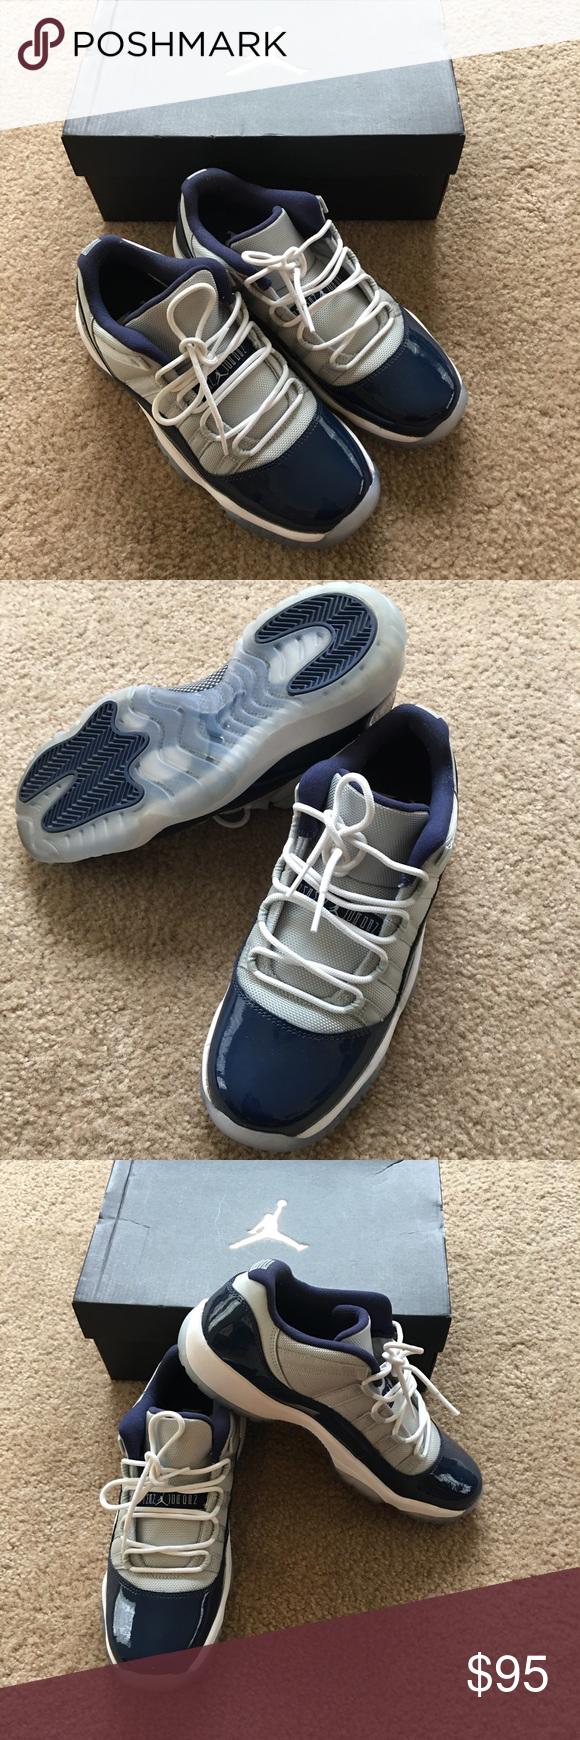 da01d8f762c2 Jordan 11 Retro Low Bought at Kids foot Locker. Worn twice